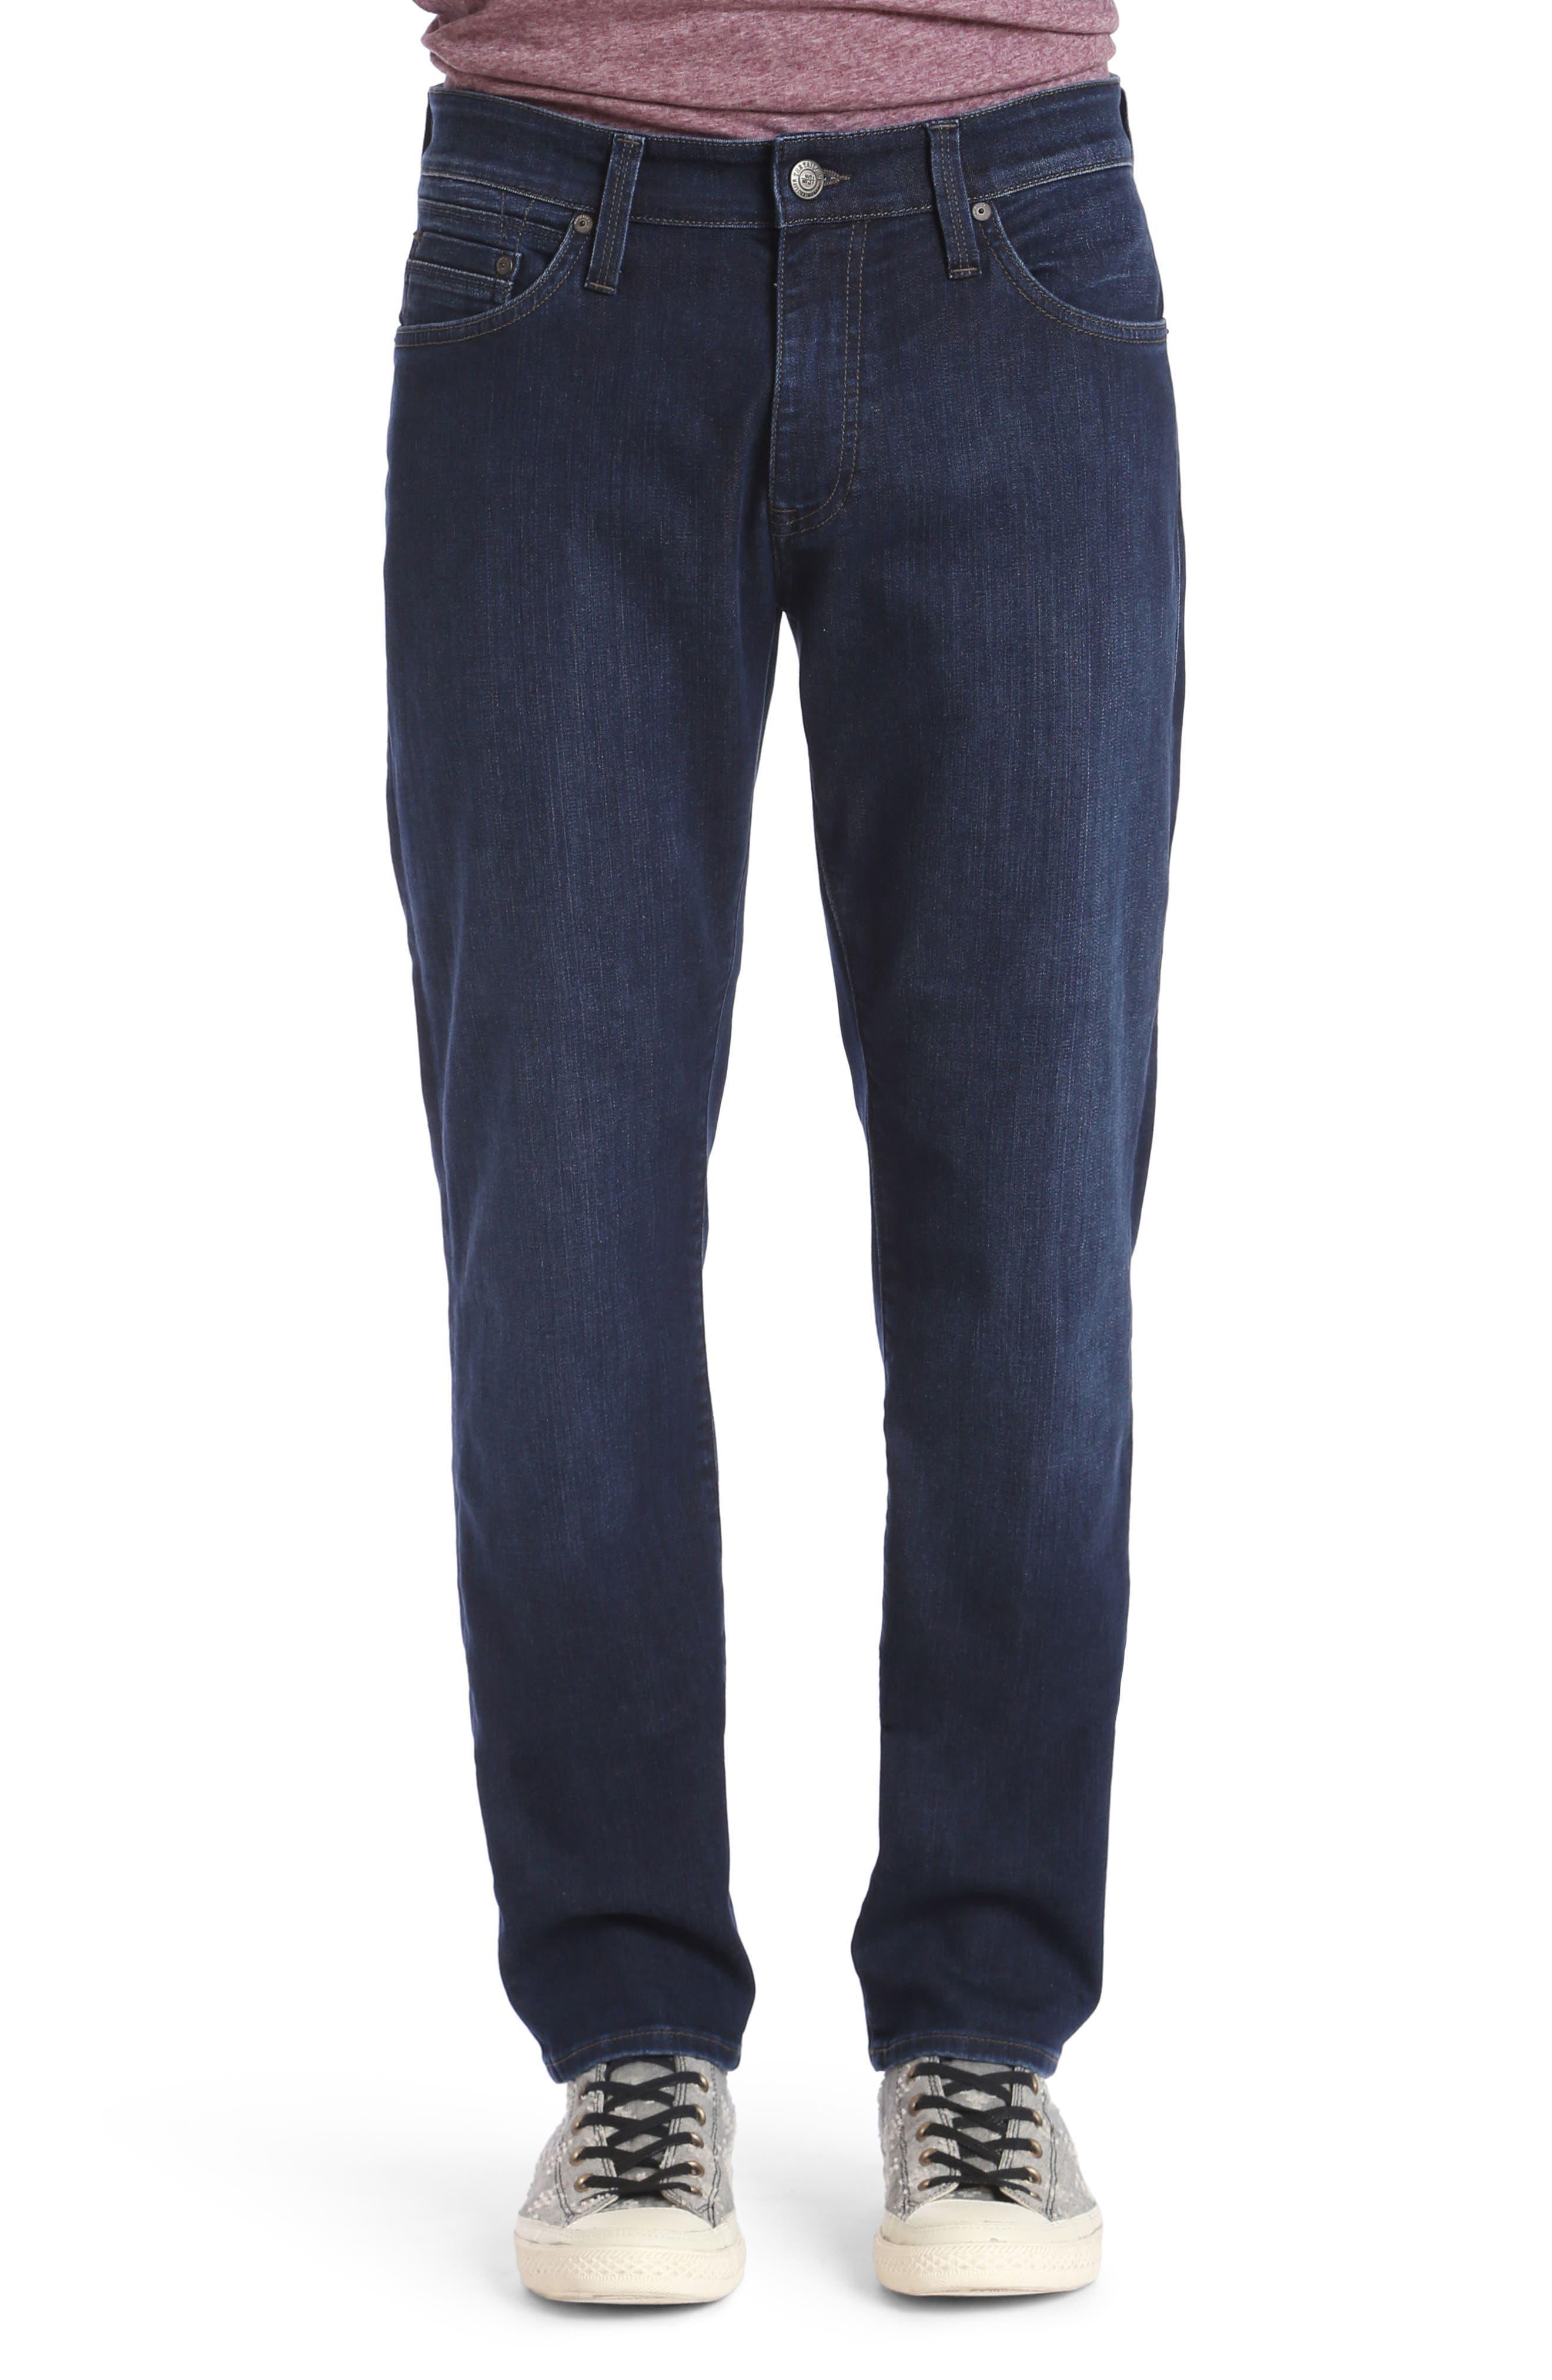 Men's Mavi Jeans Matt Relaxed Fit Jeans